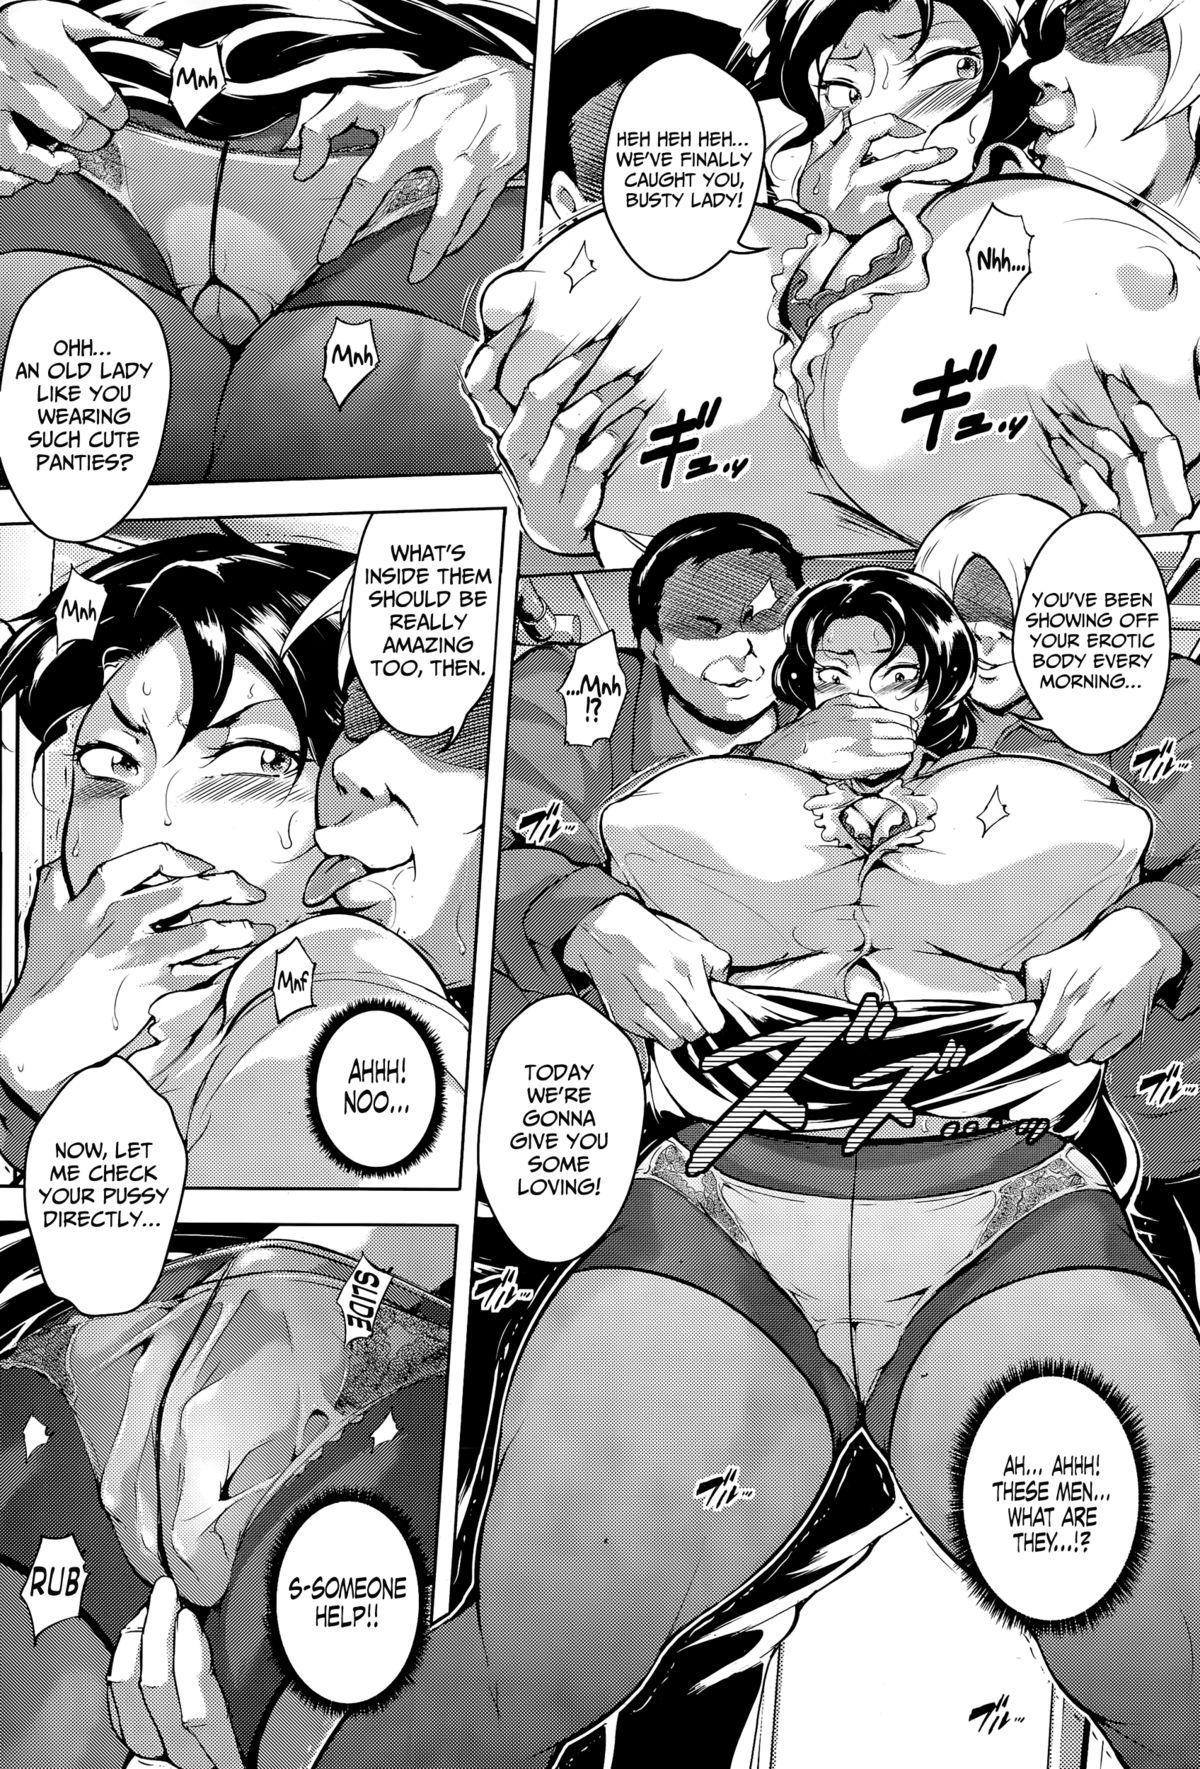 Ryoujyoku Chikan Kyuukou | Rapist Molester Express 2